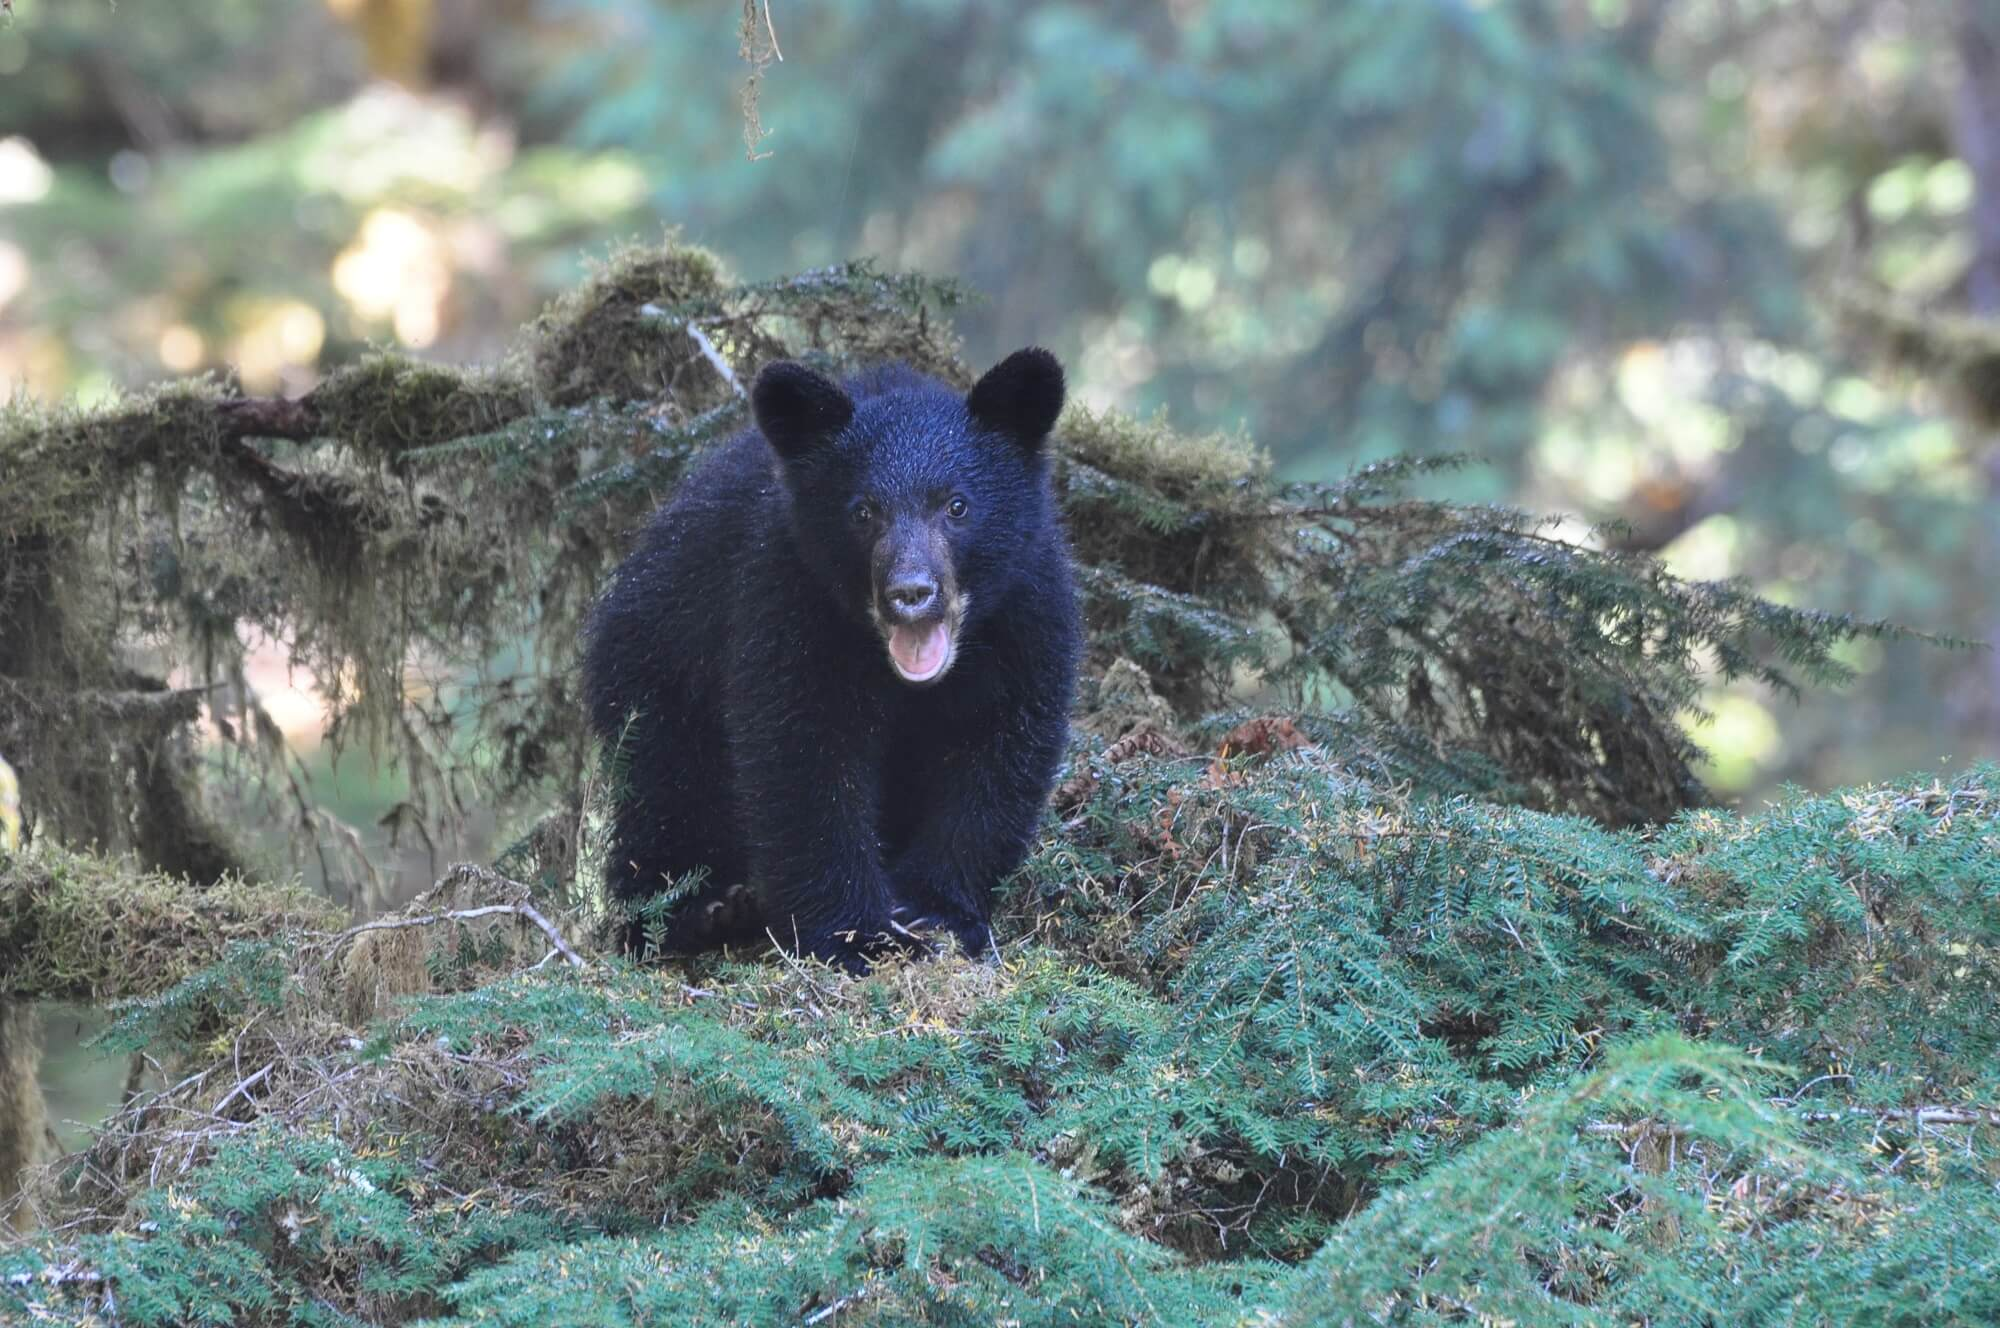 https://secureservercdn.net/72.167.241.180/c2p.415.myftpupload.com/wp-content/uploads/2018/10/Alaska-Bear-cub.jpg?time=1634200883